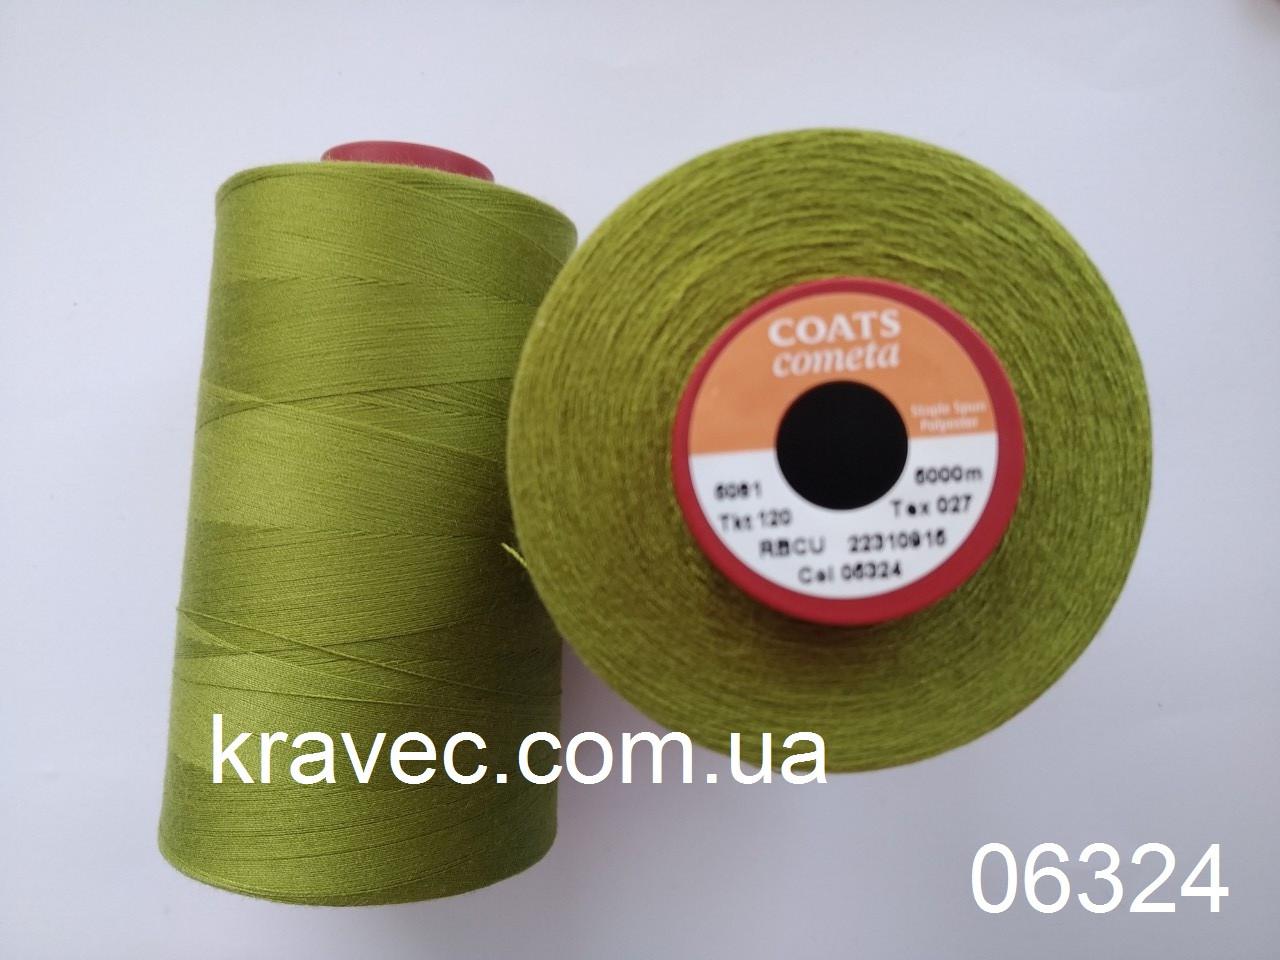 Нитки Coats Astra 05309/ 120, 5000м